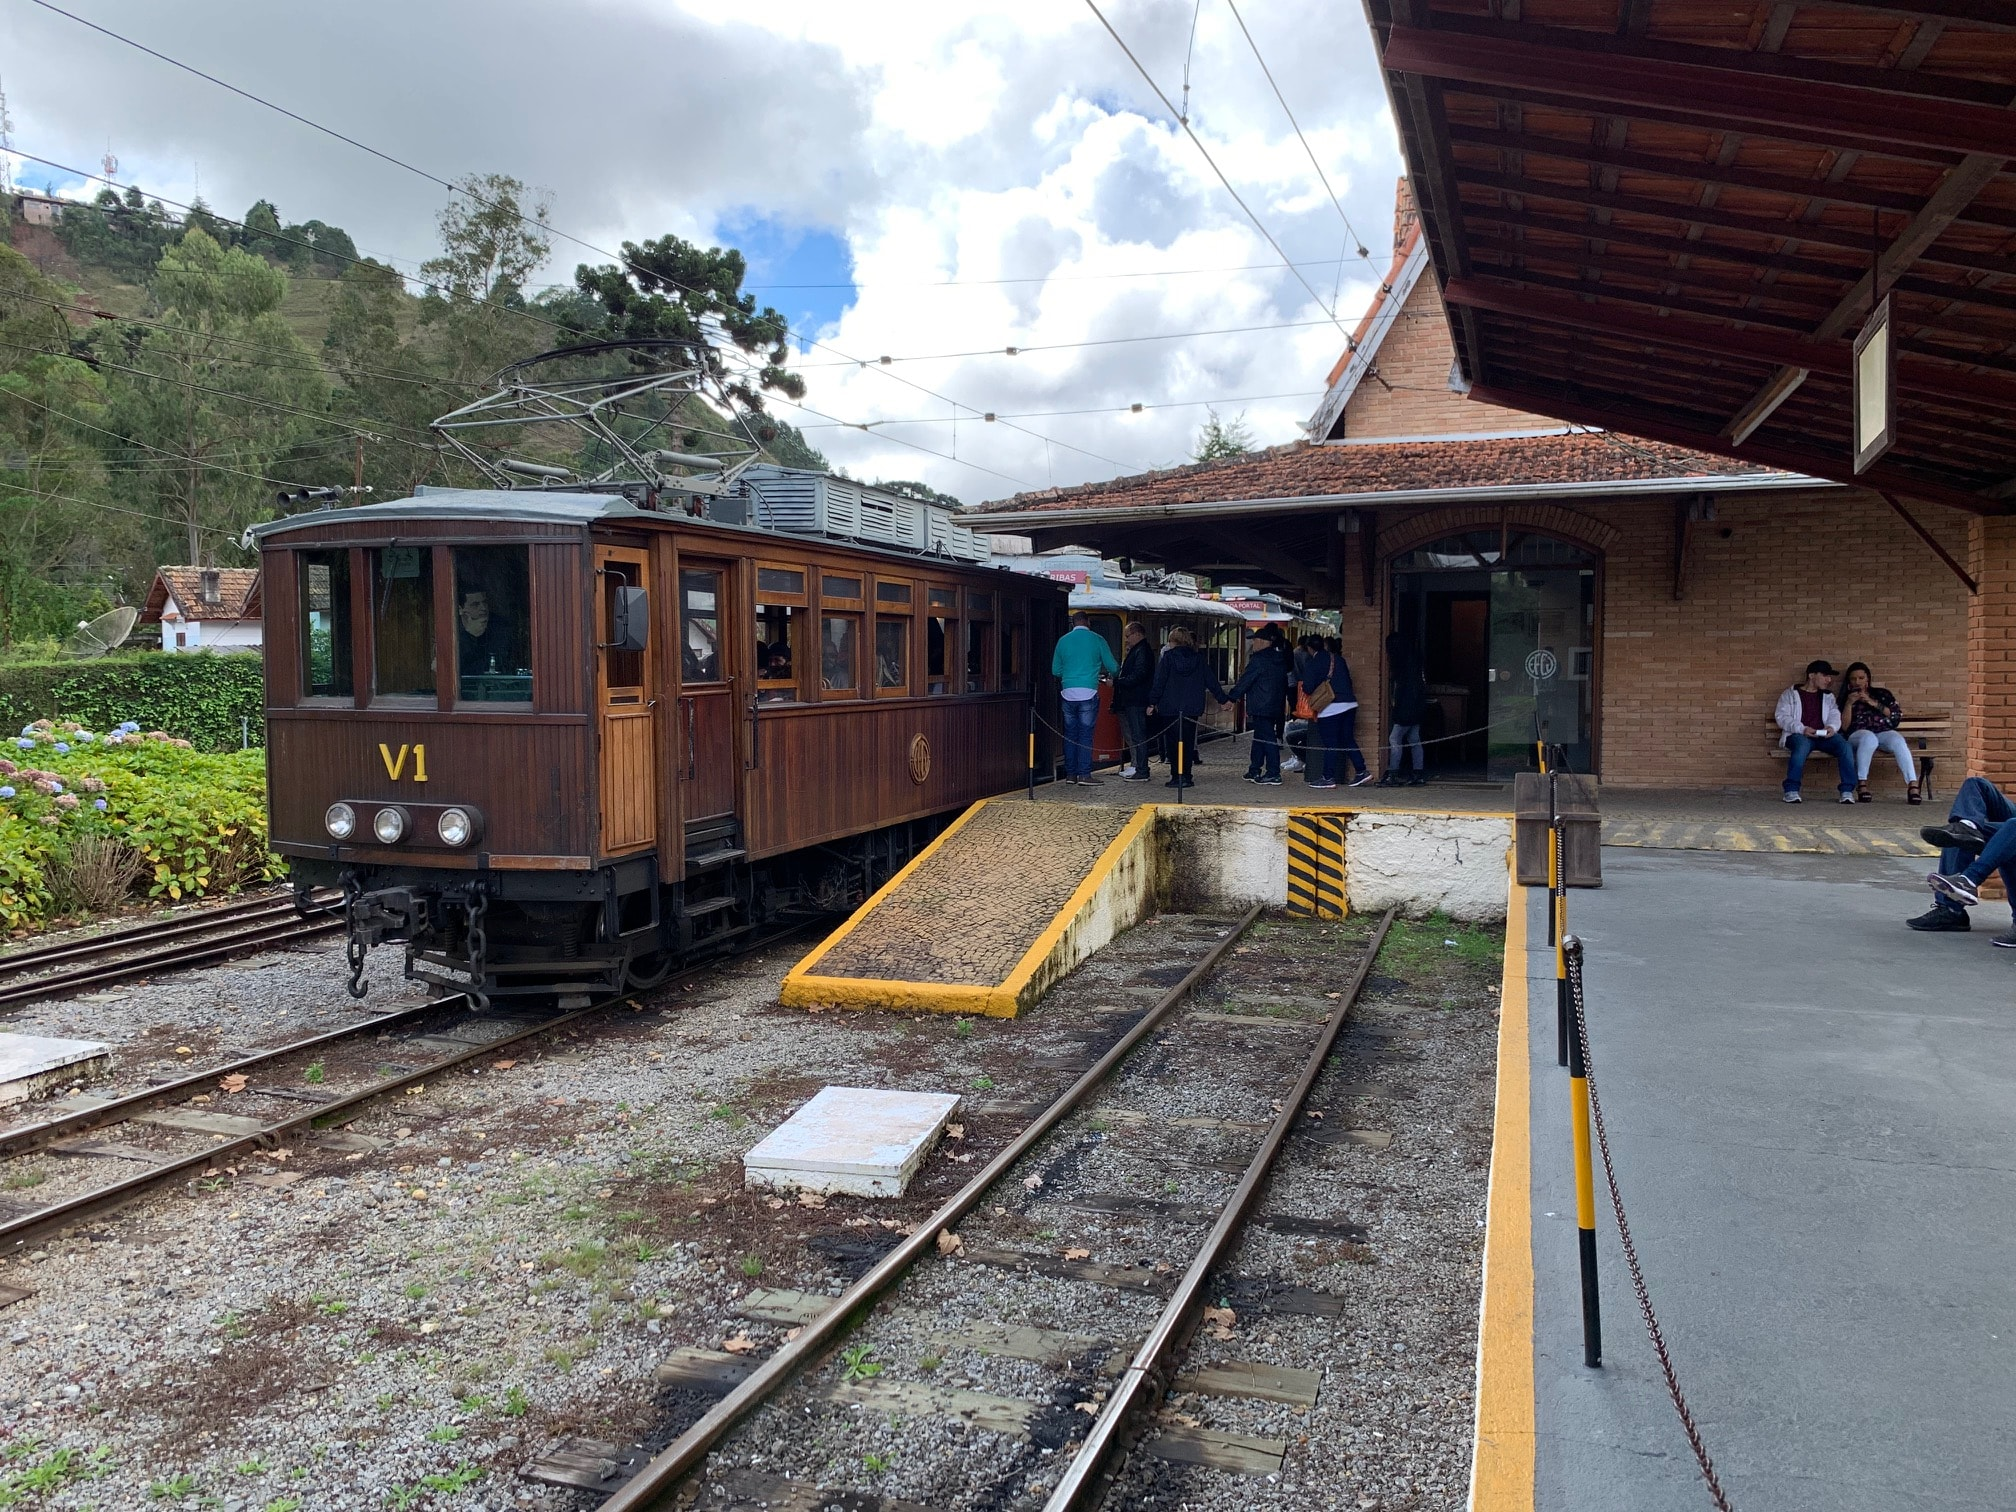 Estación de tren en Capivari